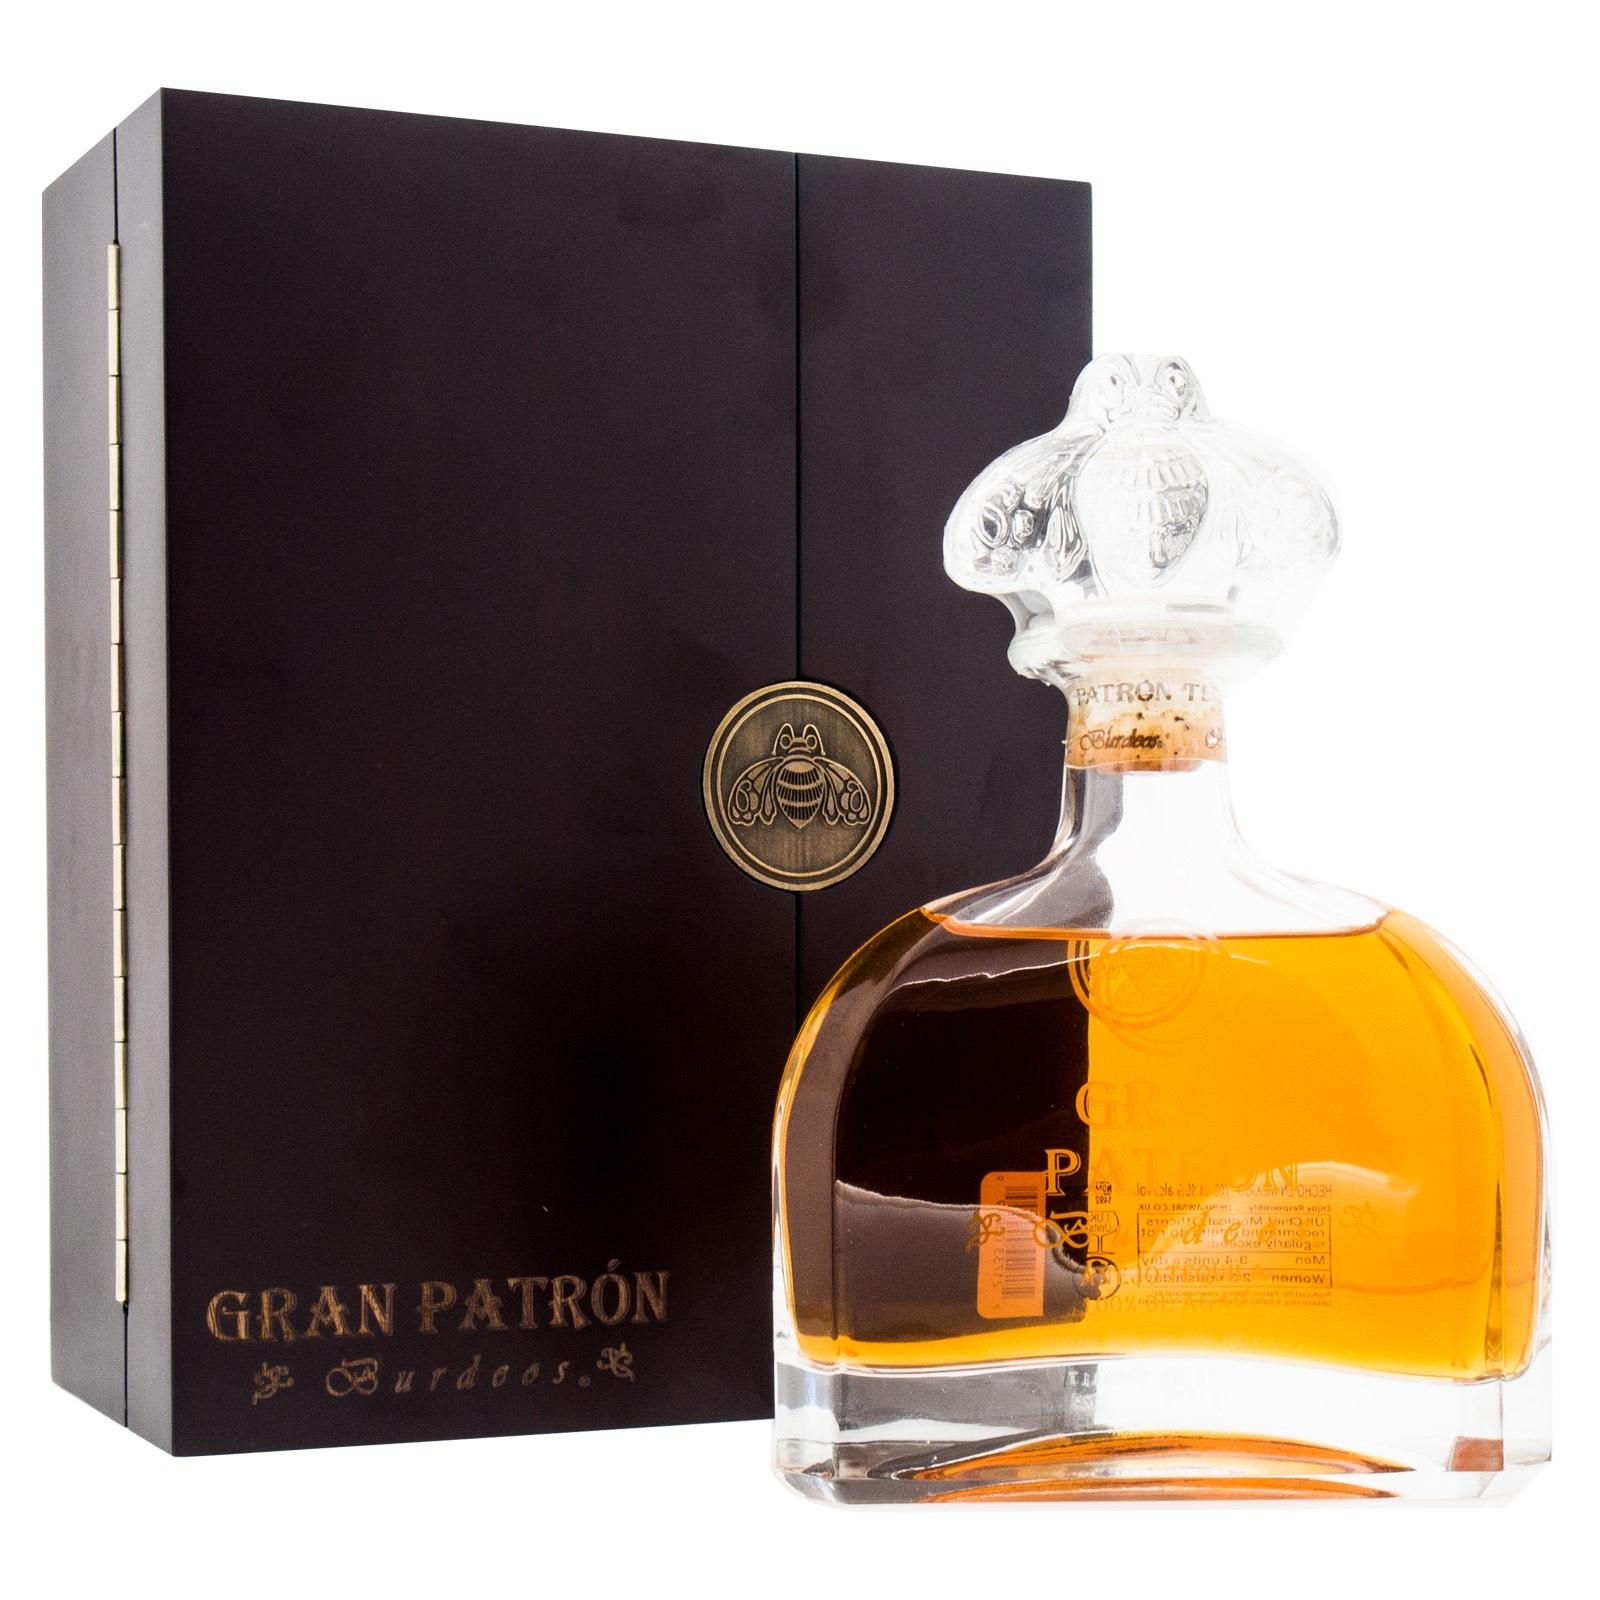 Gran Patron Tequila Burdeos Anejo + GB 700ml 40% Vol.